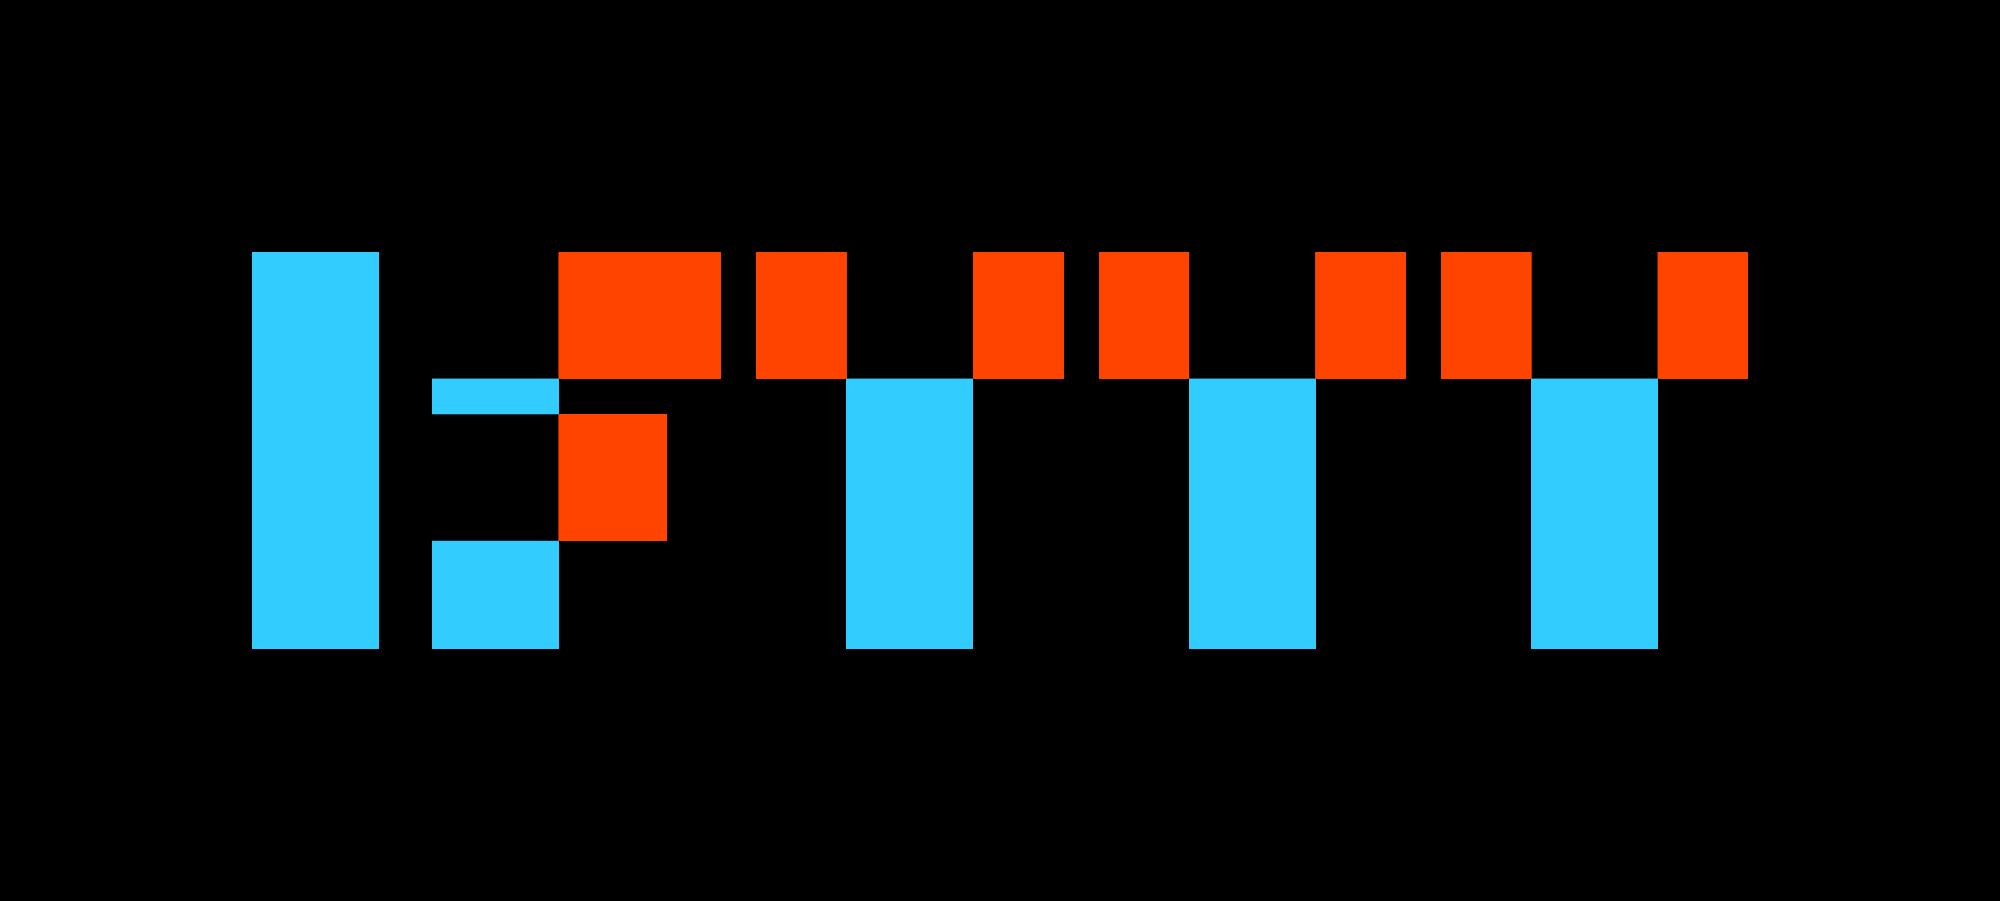 ifttt logo j5wy